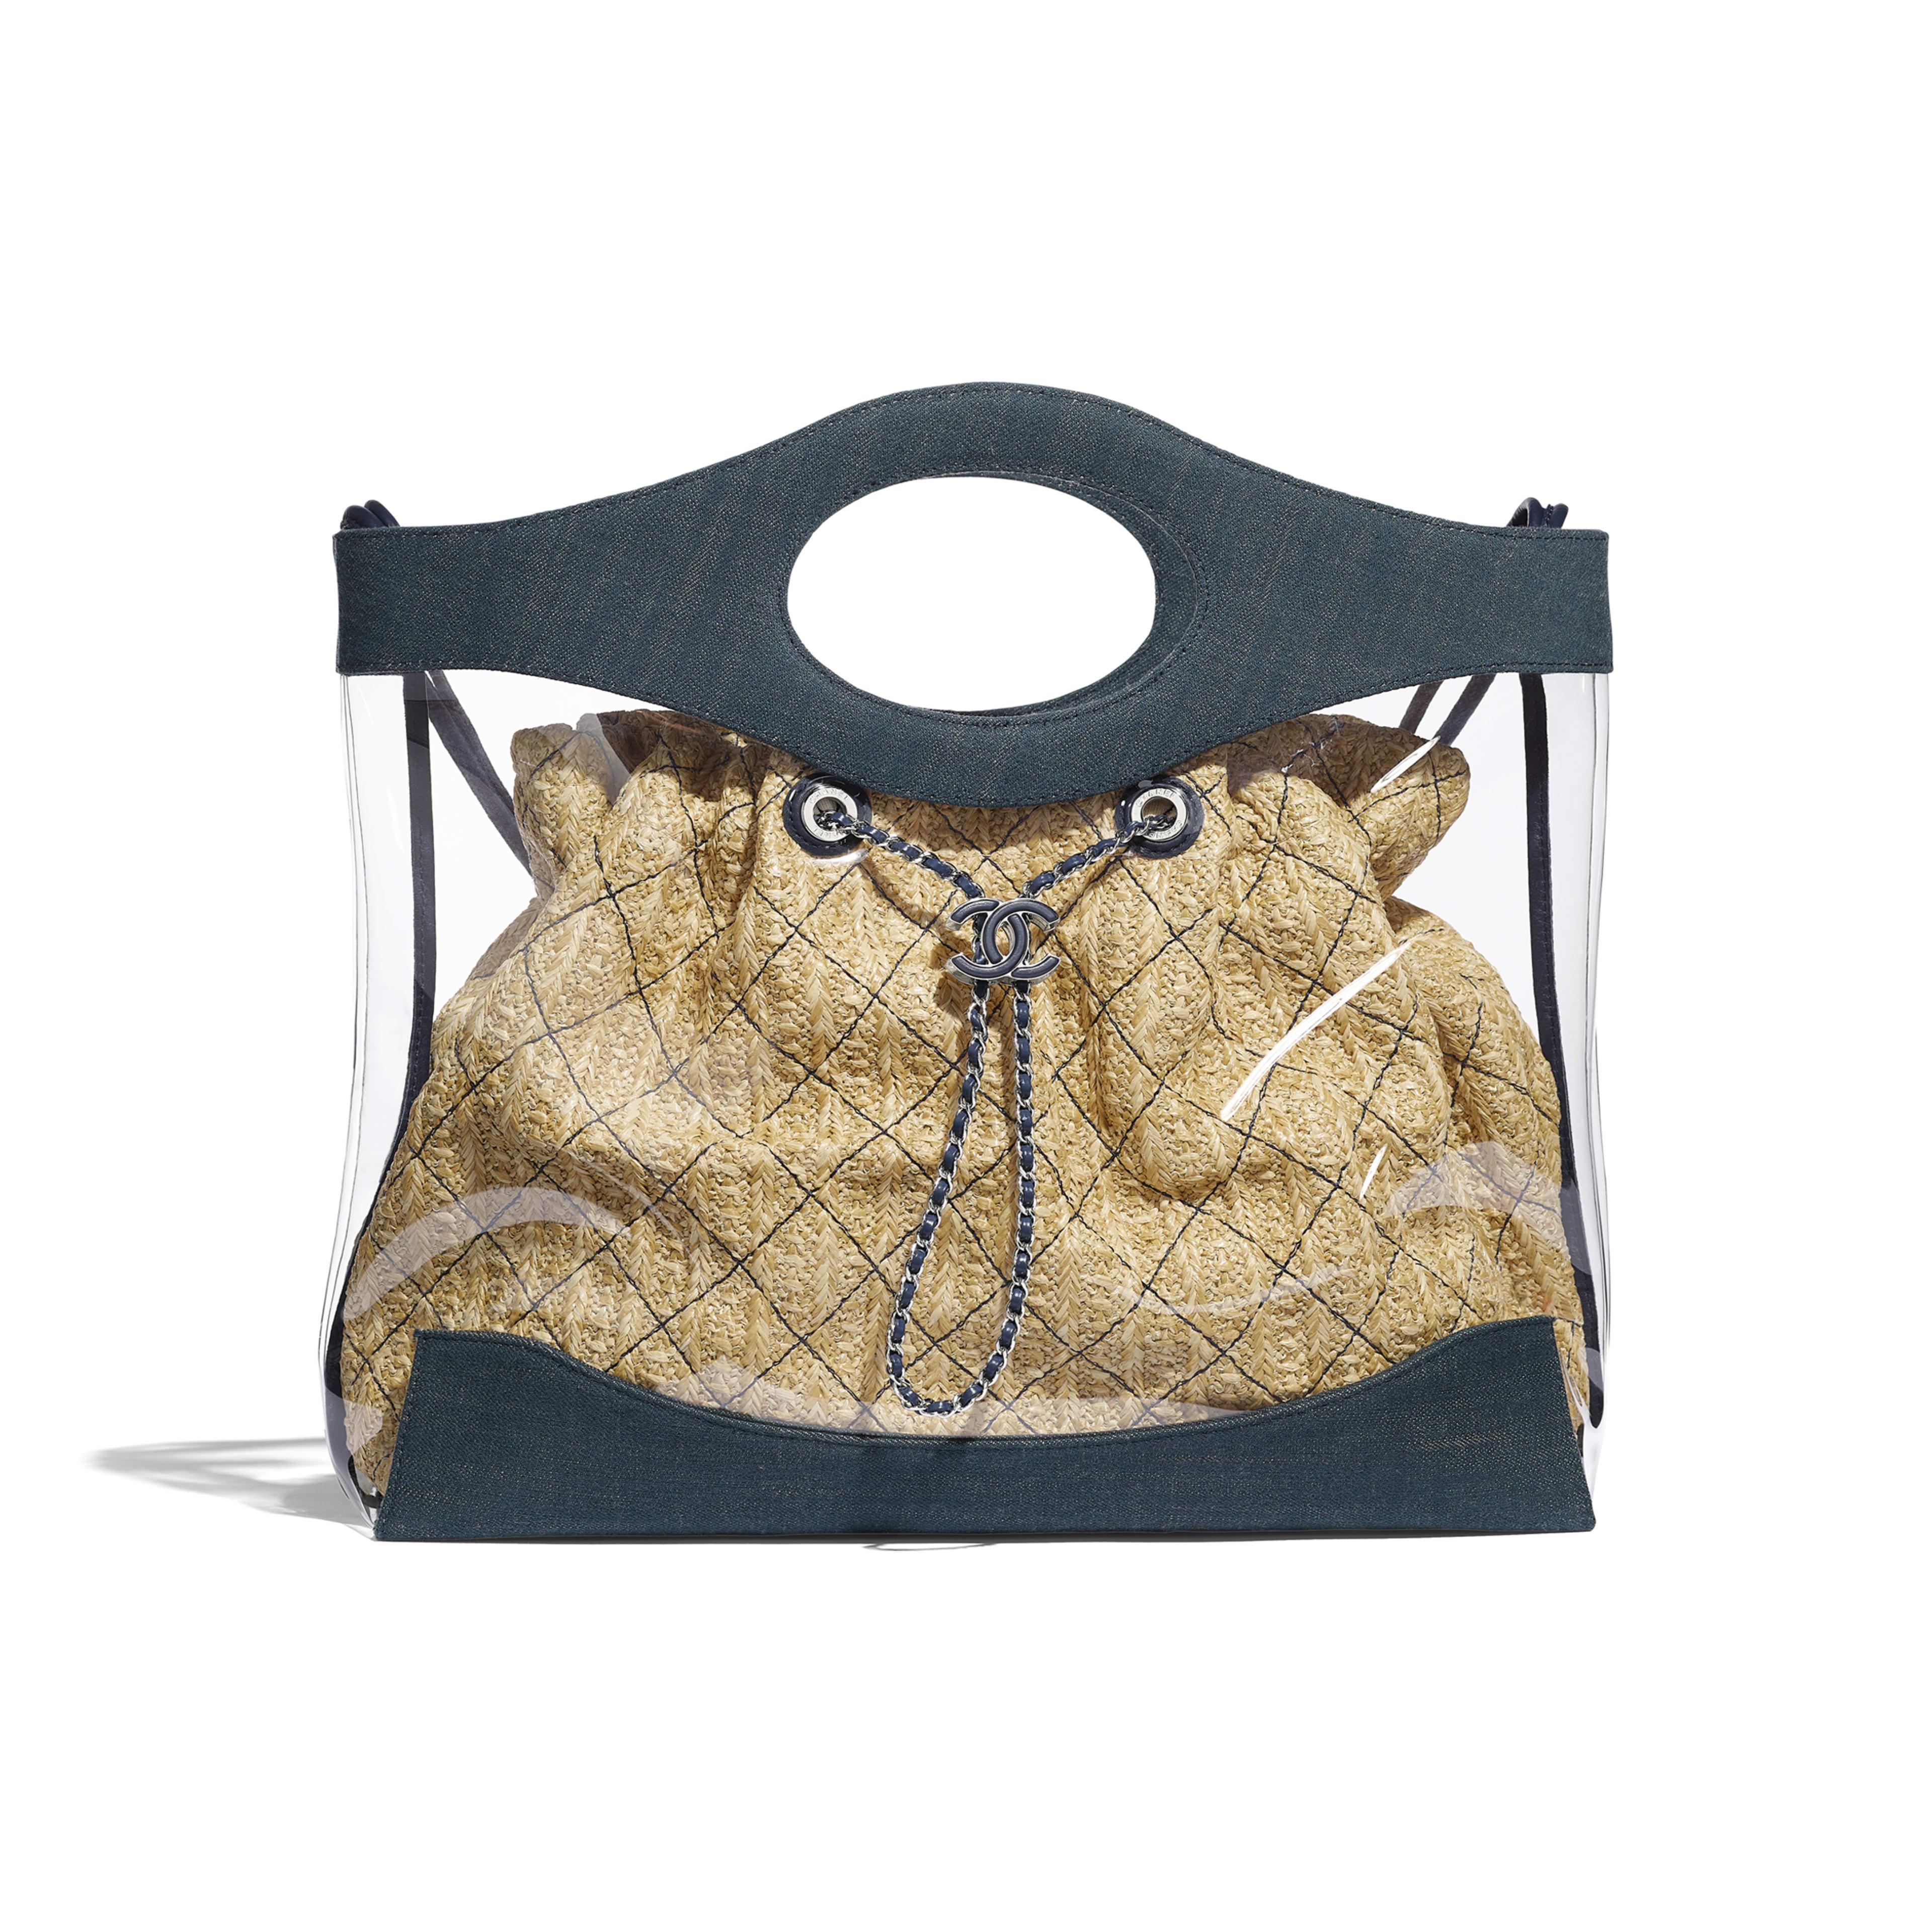 CHANEL 31 Shopping Bag - Blue - PVC, Denim, Calfskin & Silver-Tone Metal - Default view - see full sized version